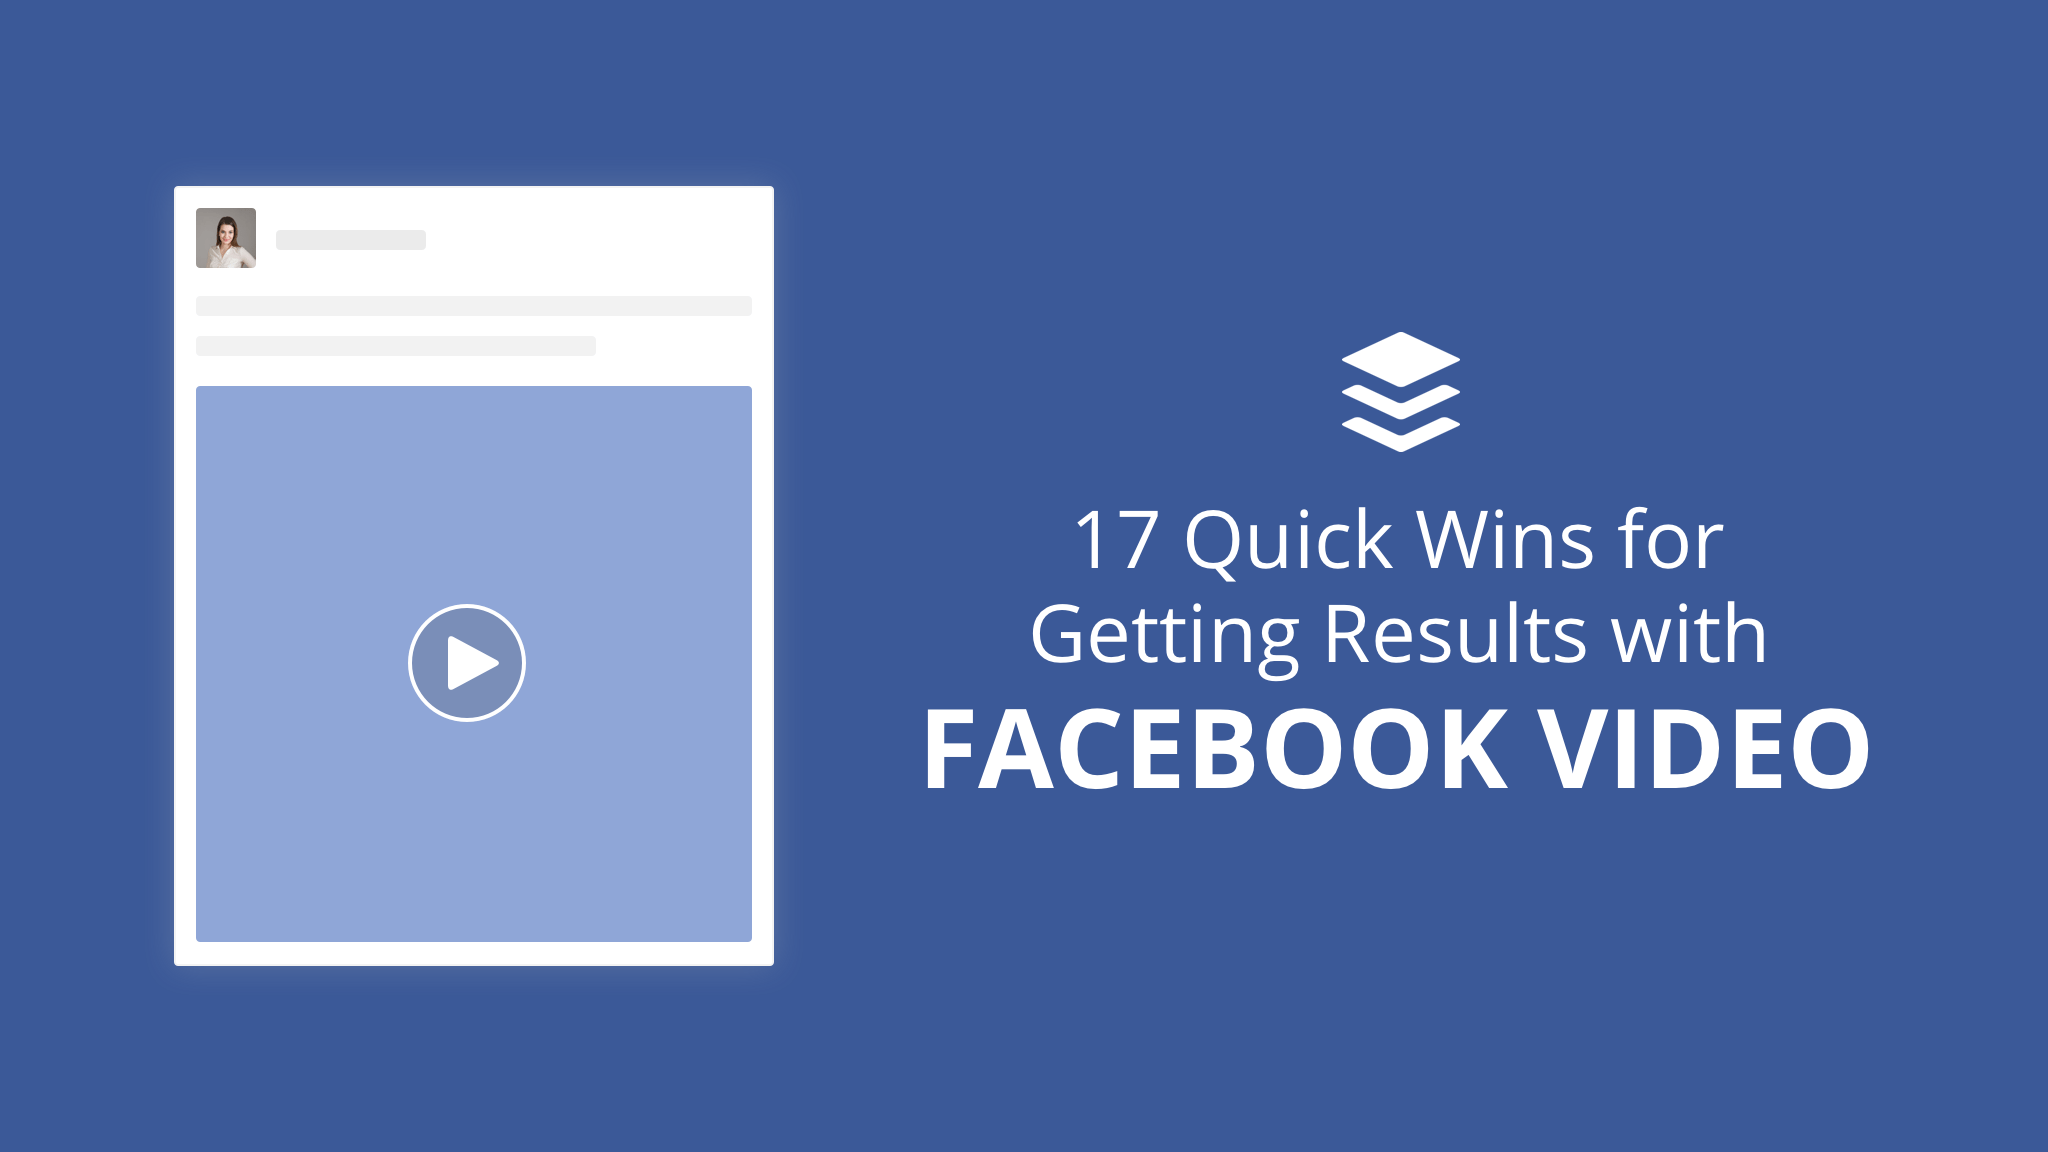 Facebook video tips